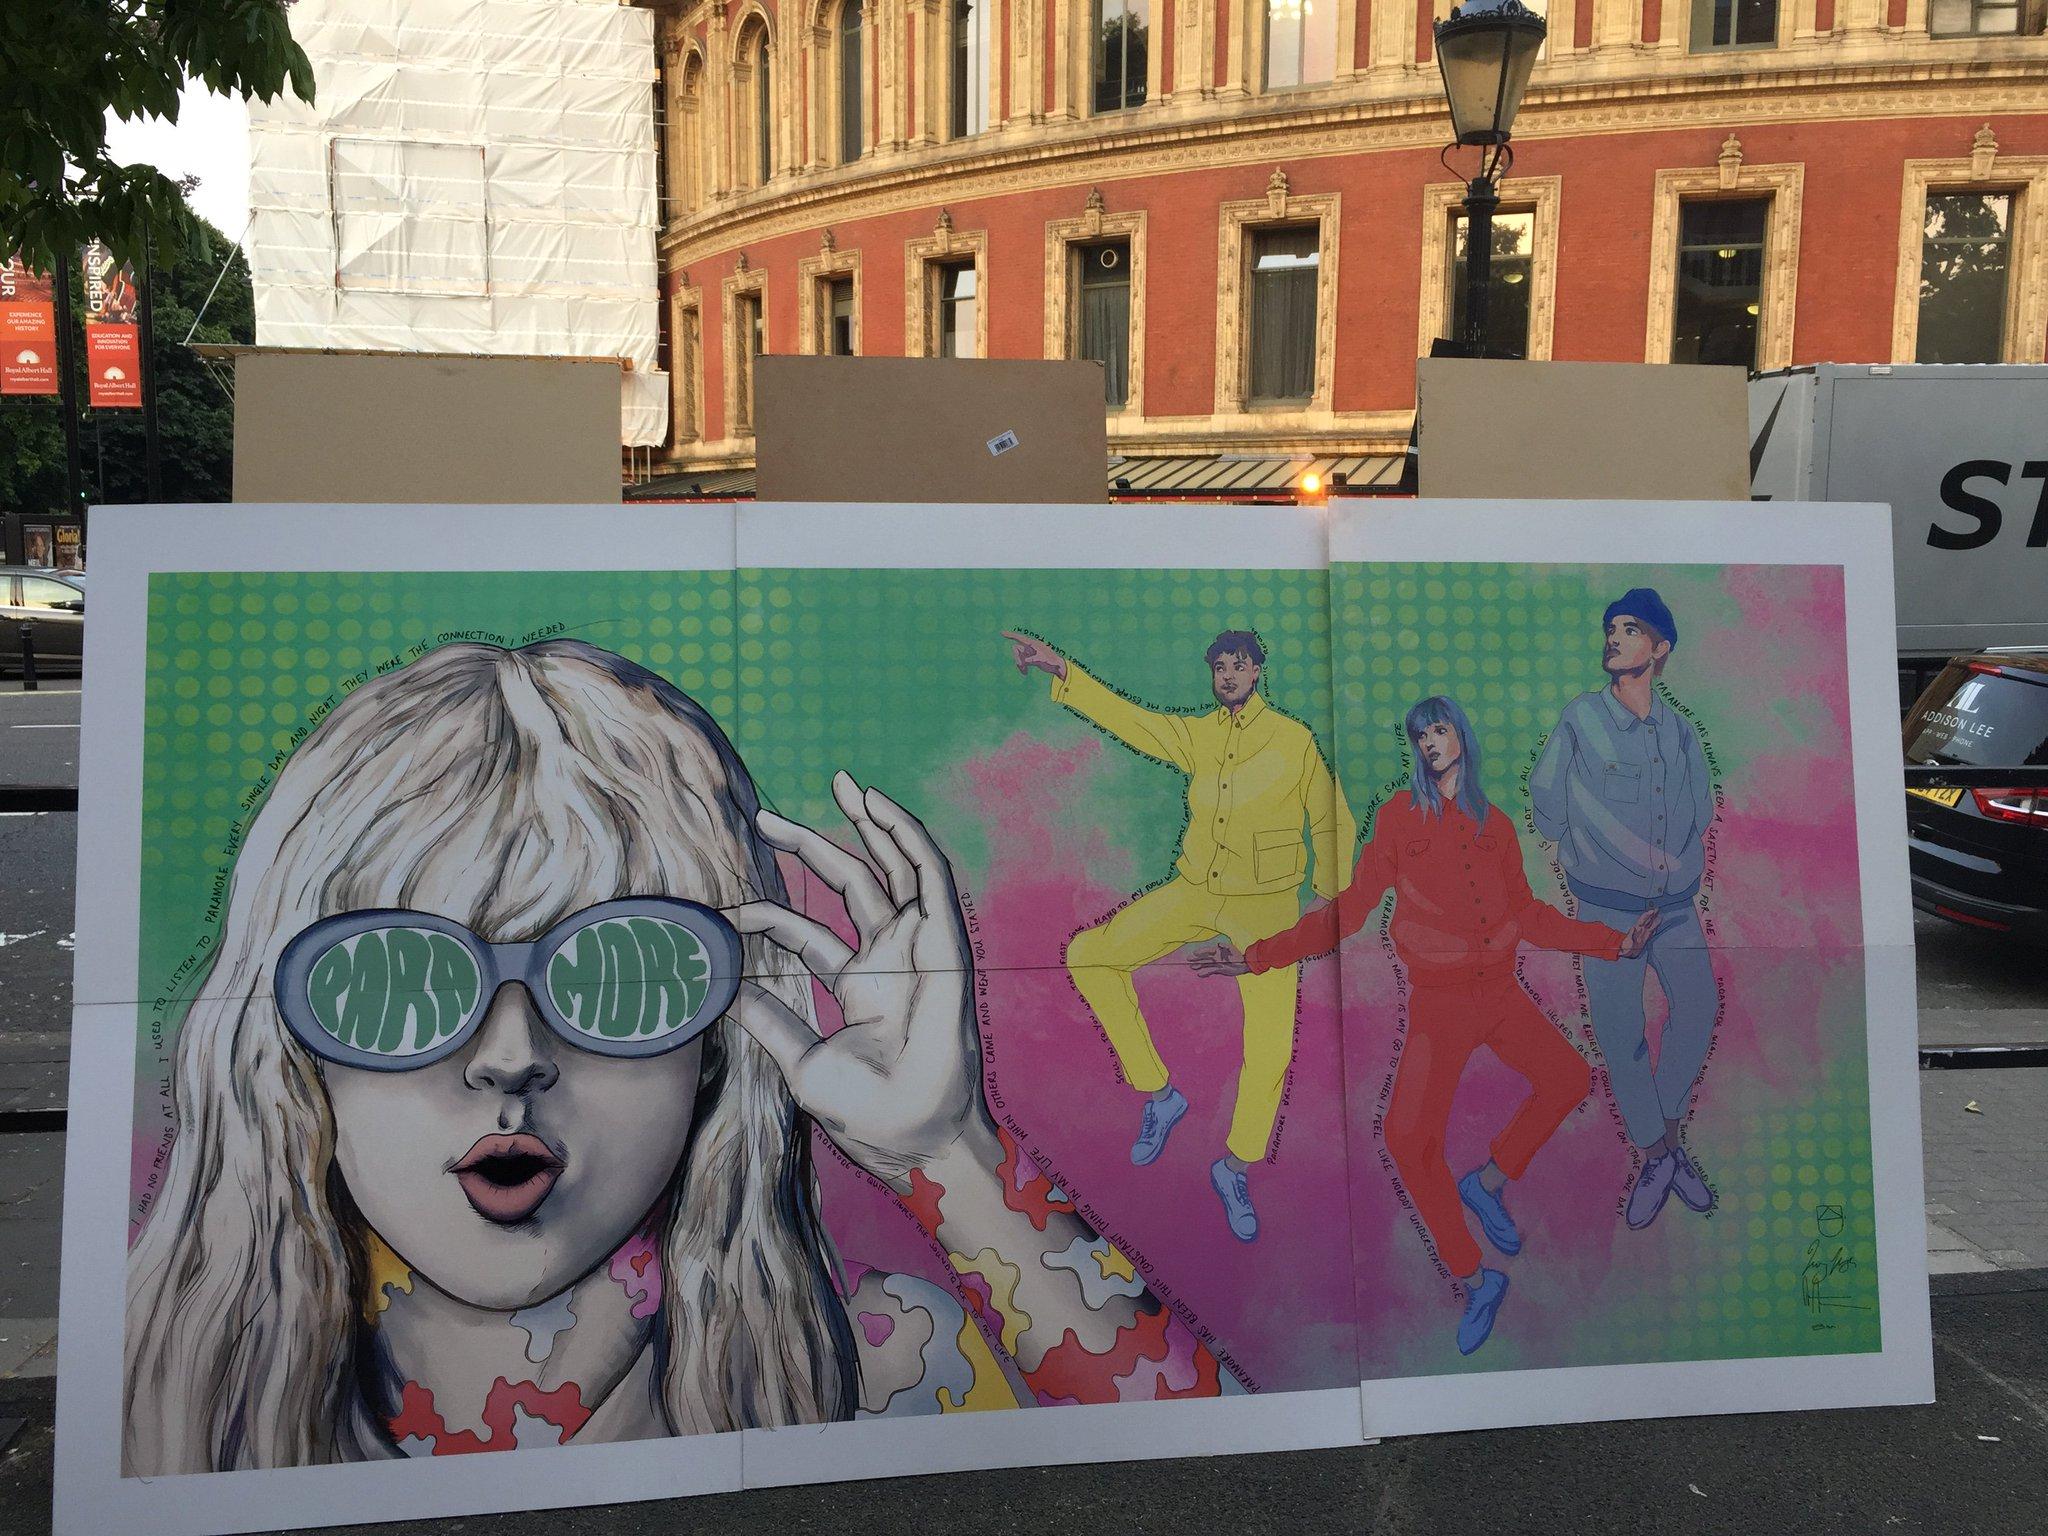 Hard Times �� in London, mural by @missledster. https://t.co/1lLcWwMNZC